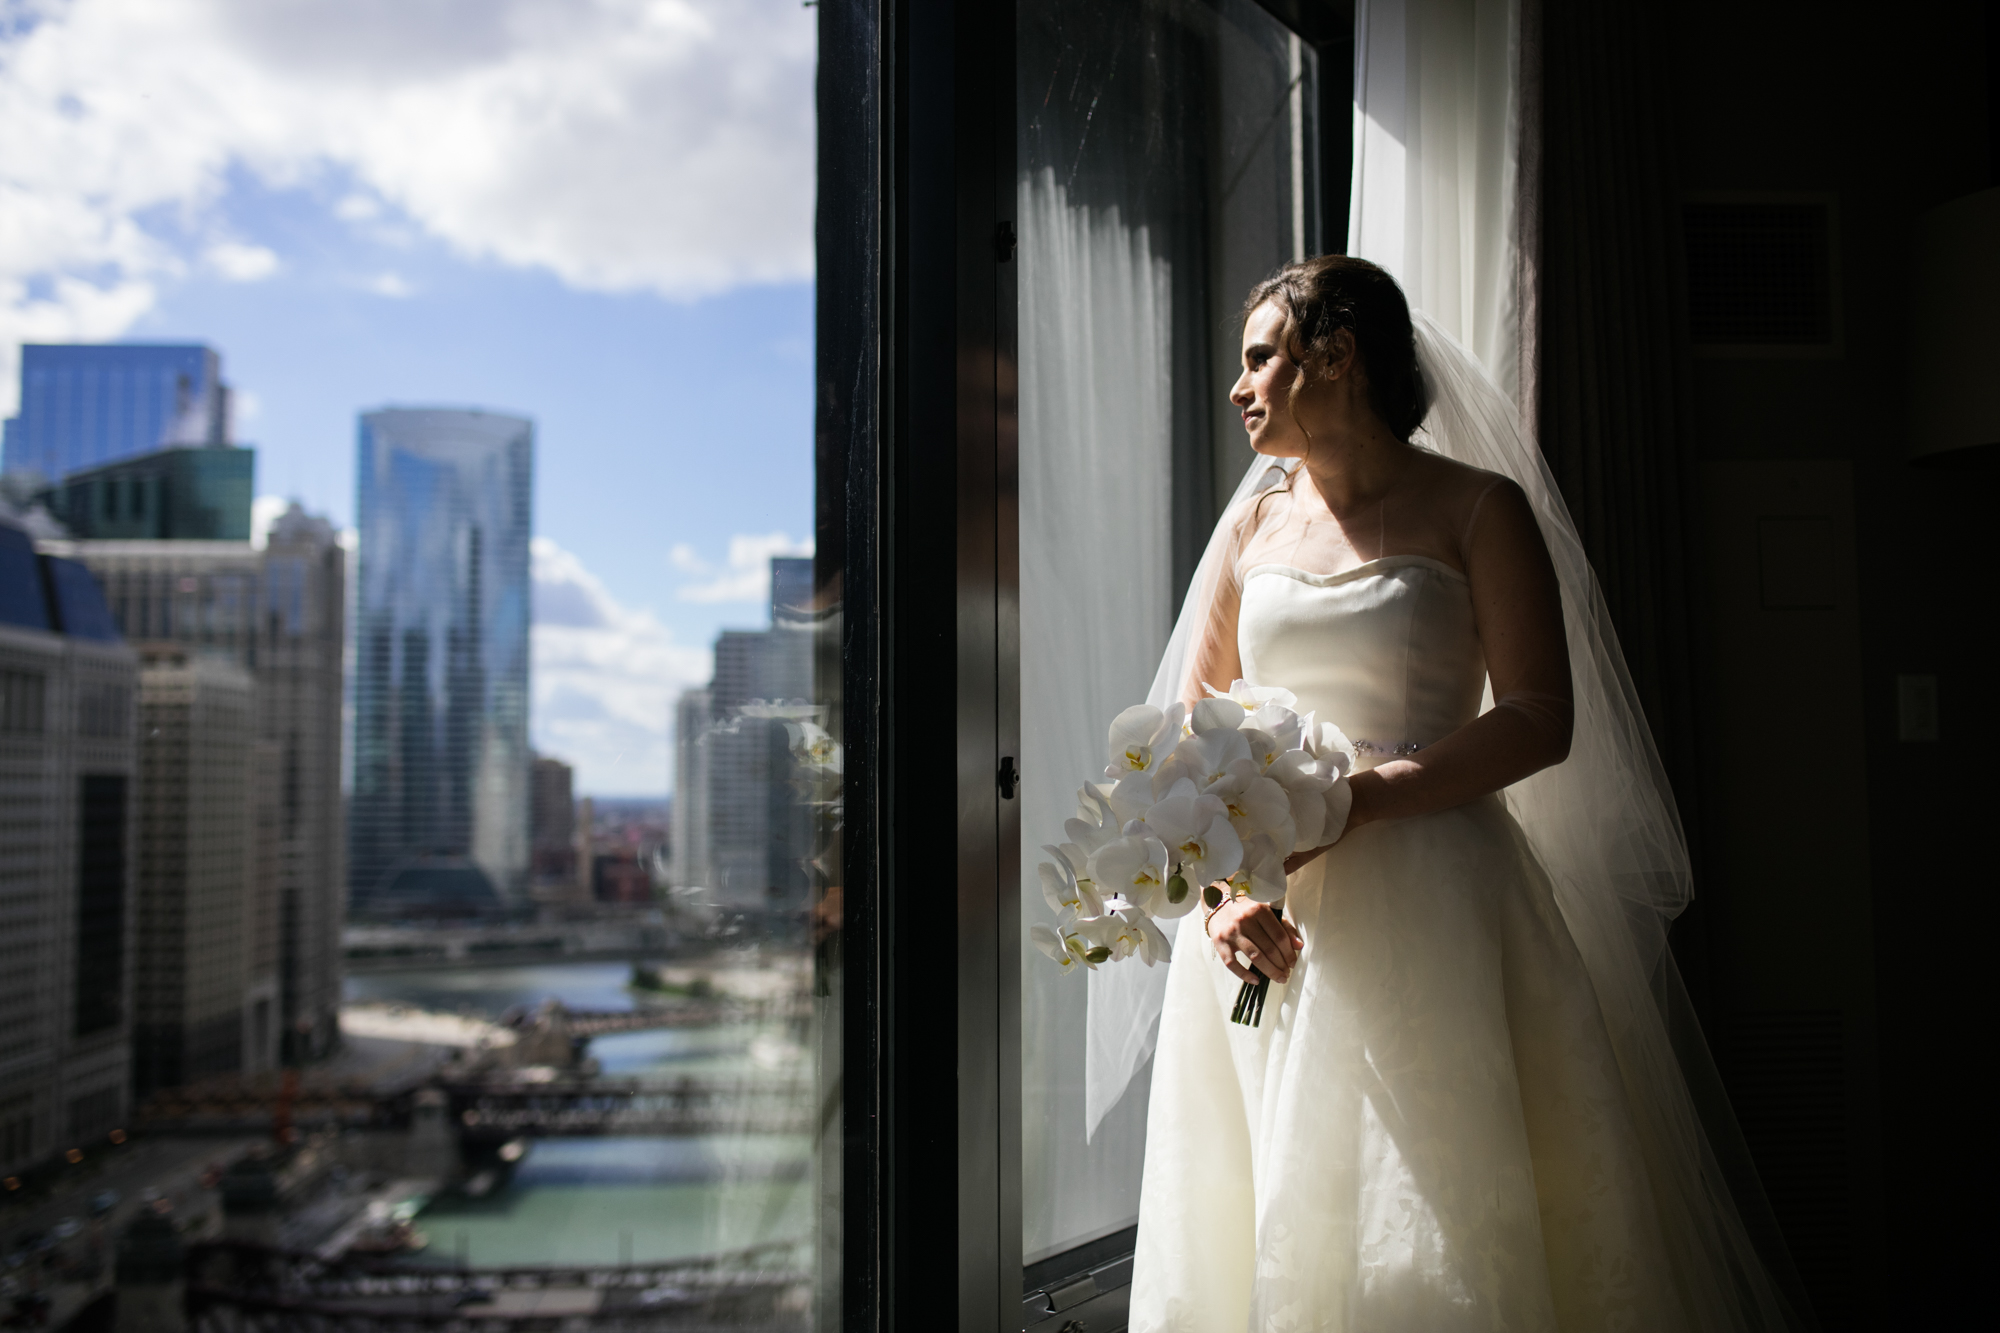 Bridal portrait against the Chicago skyline.